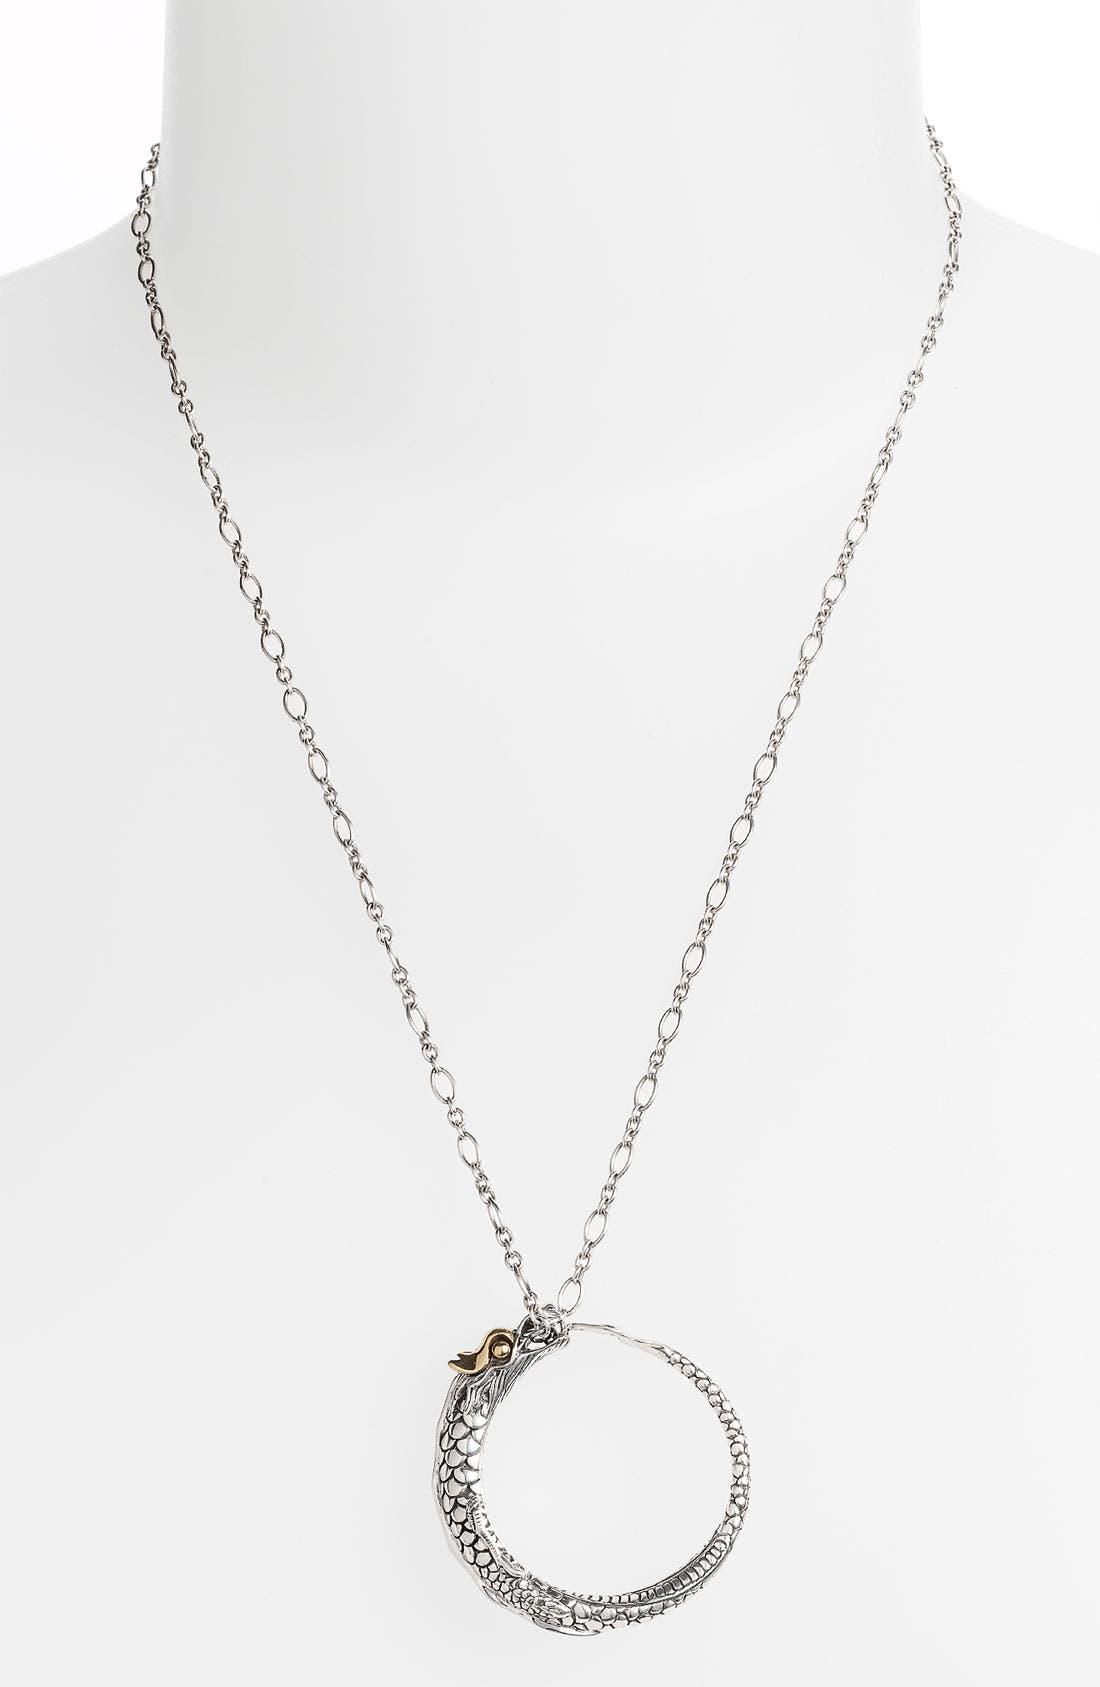 Alternate Image 1 Selected - John Hardy 'Naga' Pendant Necklace